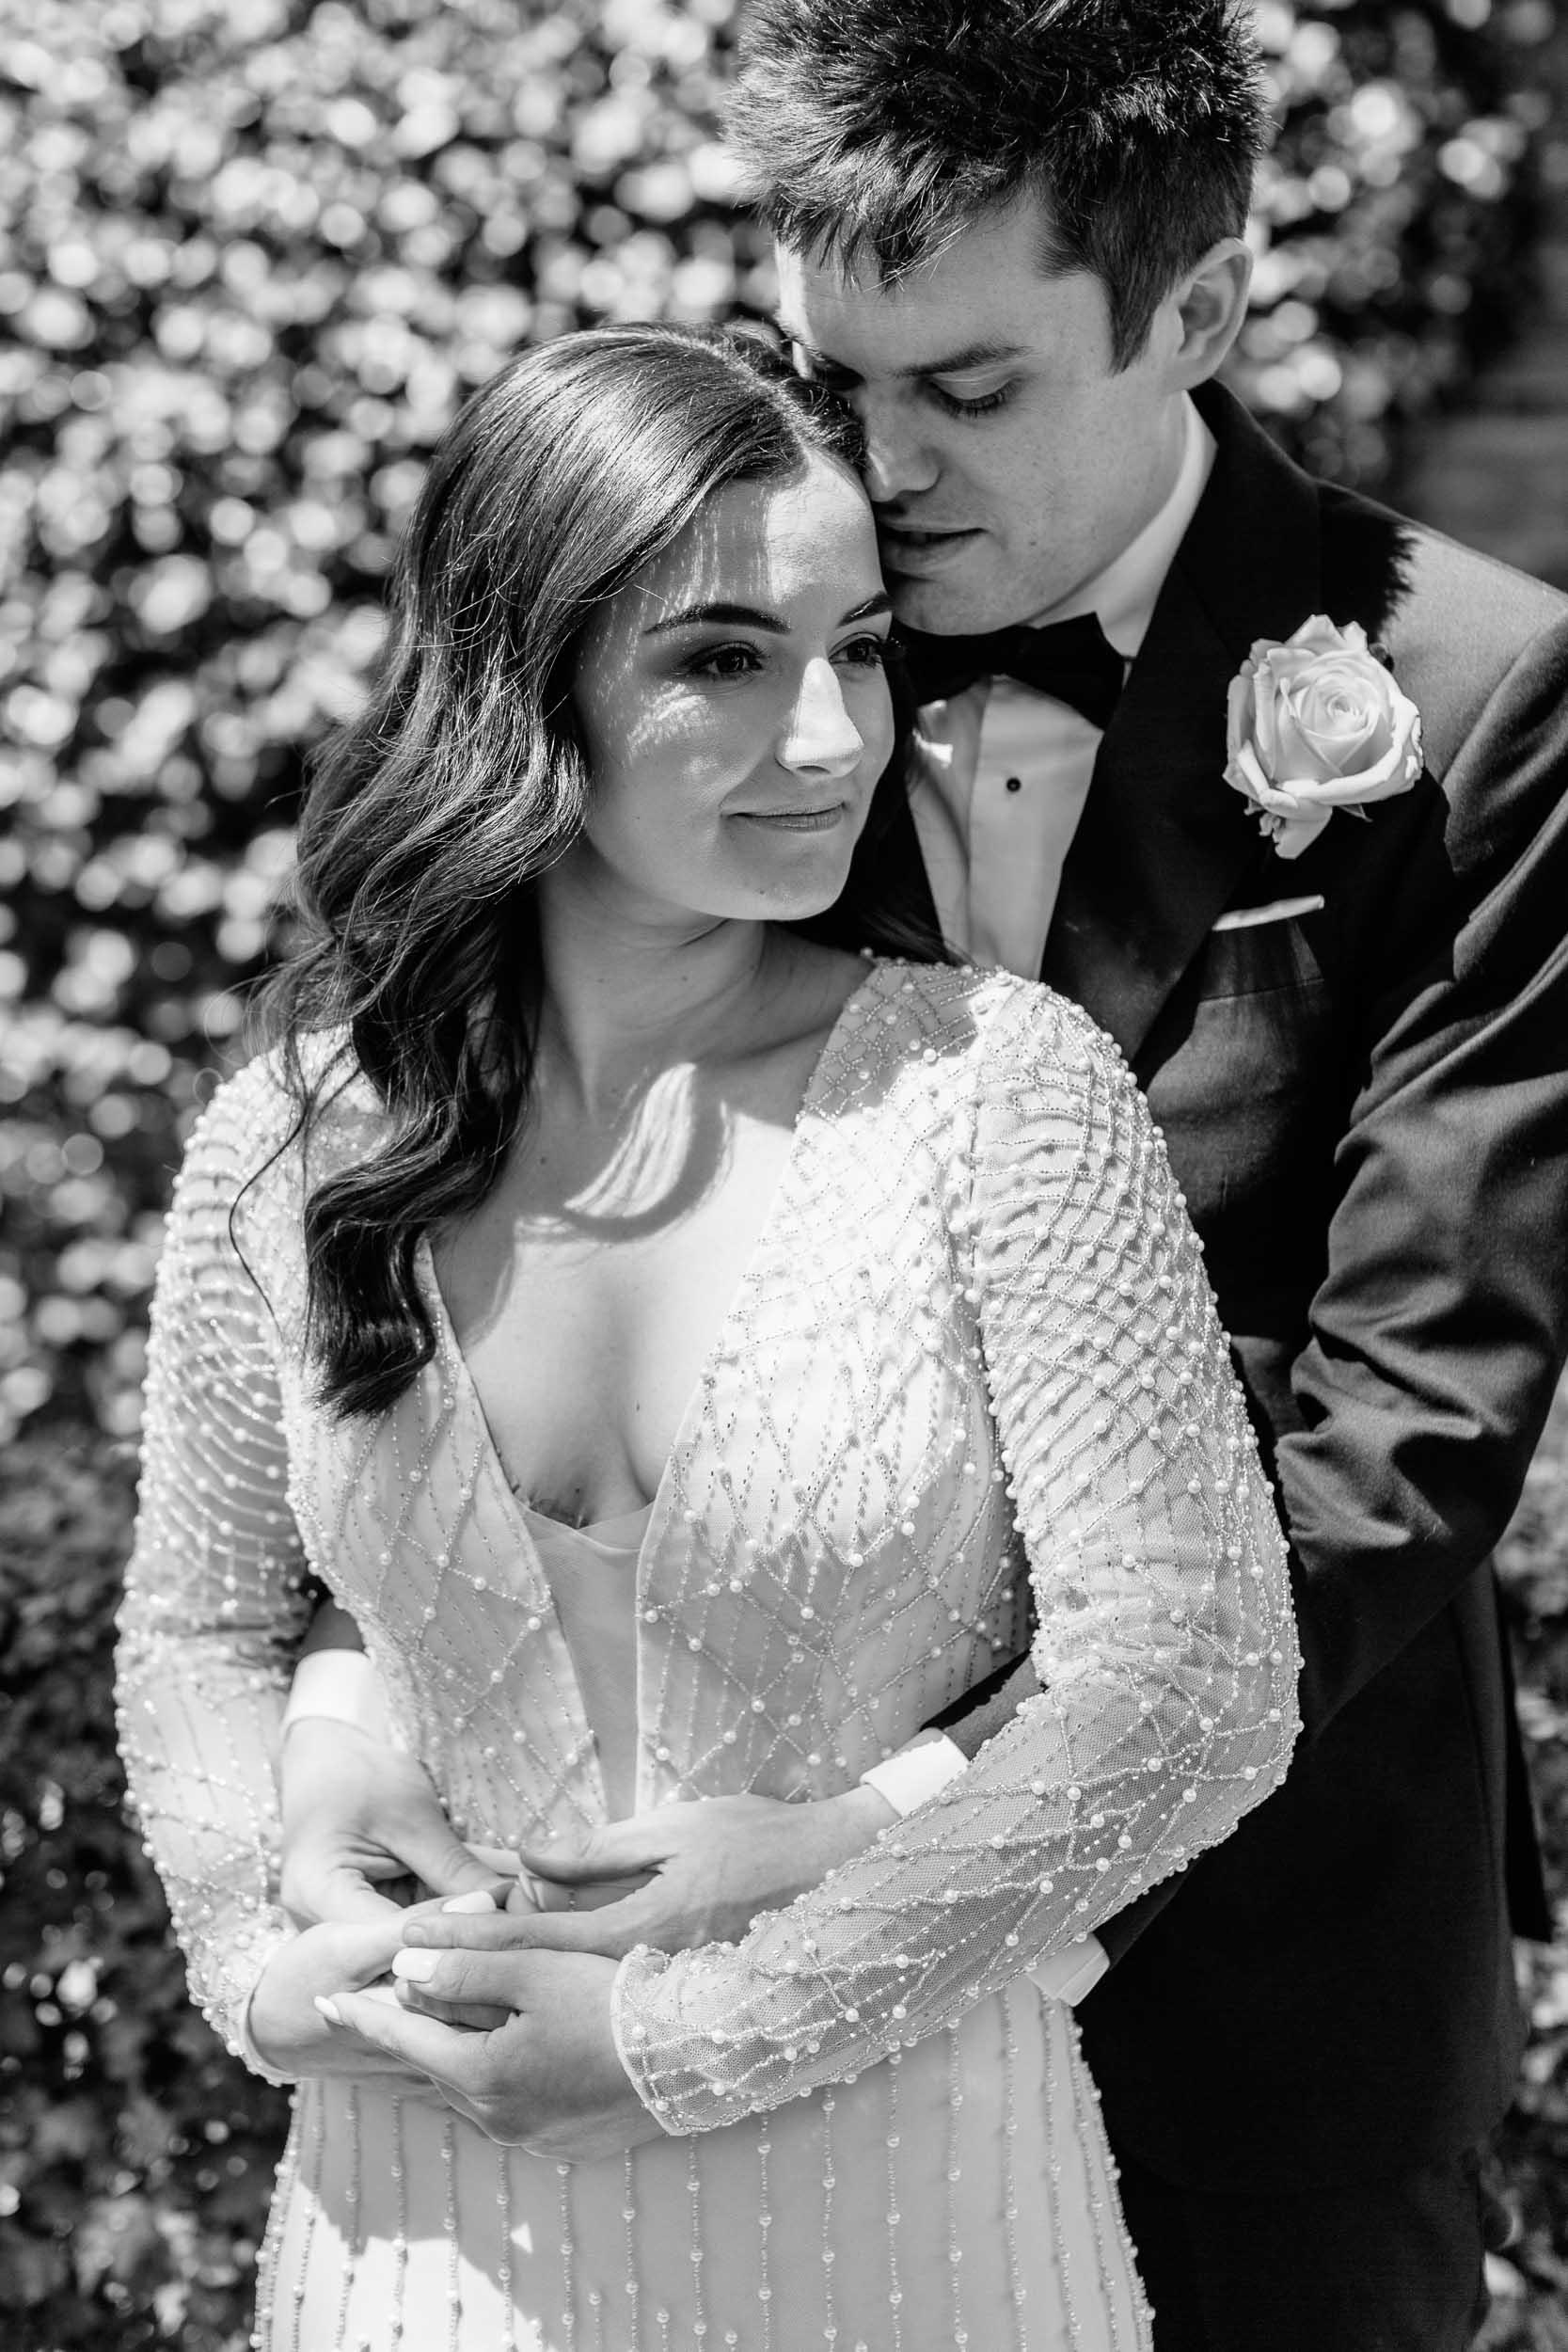 Kas-Richards-Wedding-Photographer-Melbourne-City-Wedding-Alto-Event-Space-Jane-Hill-Bridal-Gown-9.jpg